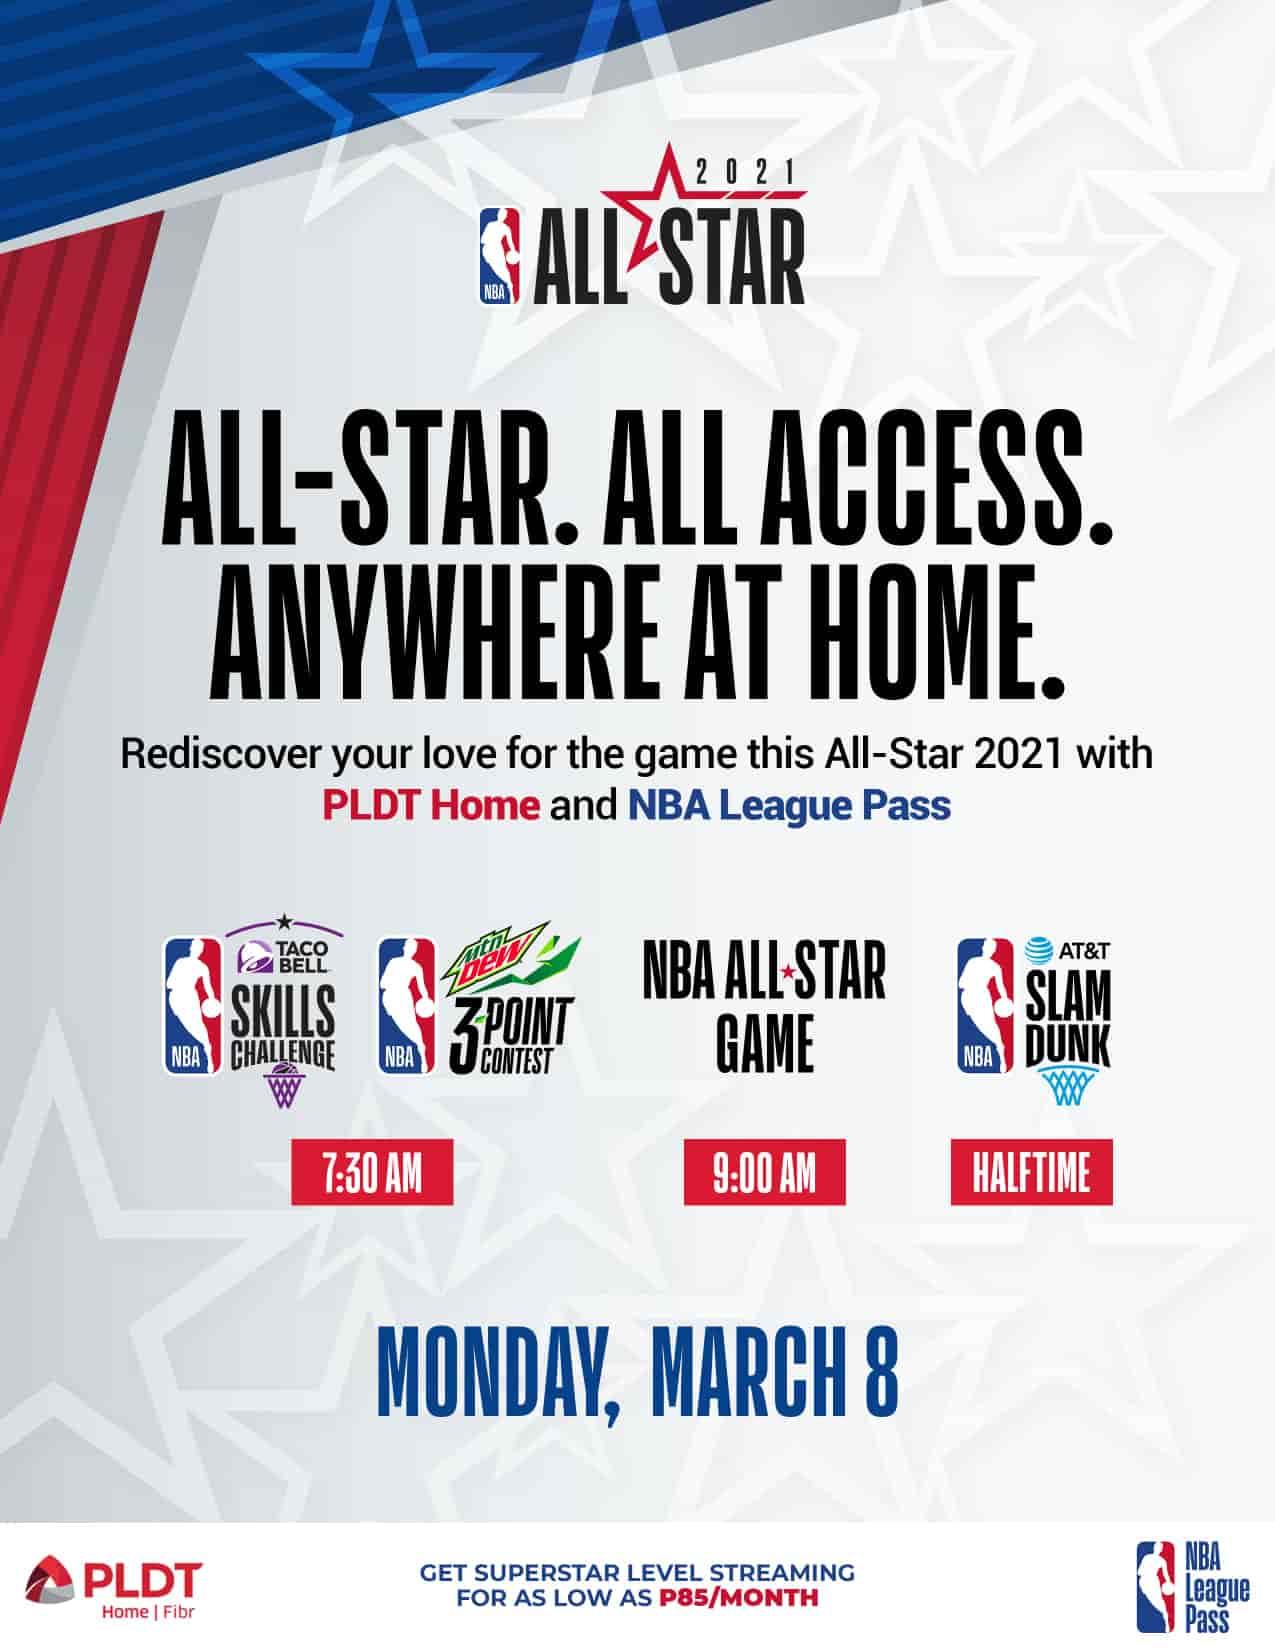 PLDT Home Fibr NBA League Pass poster schedule of shows